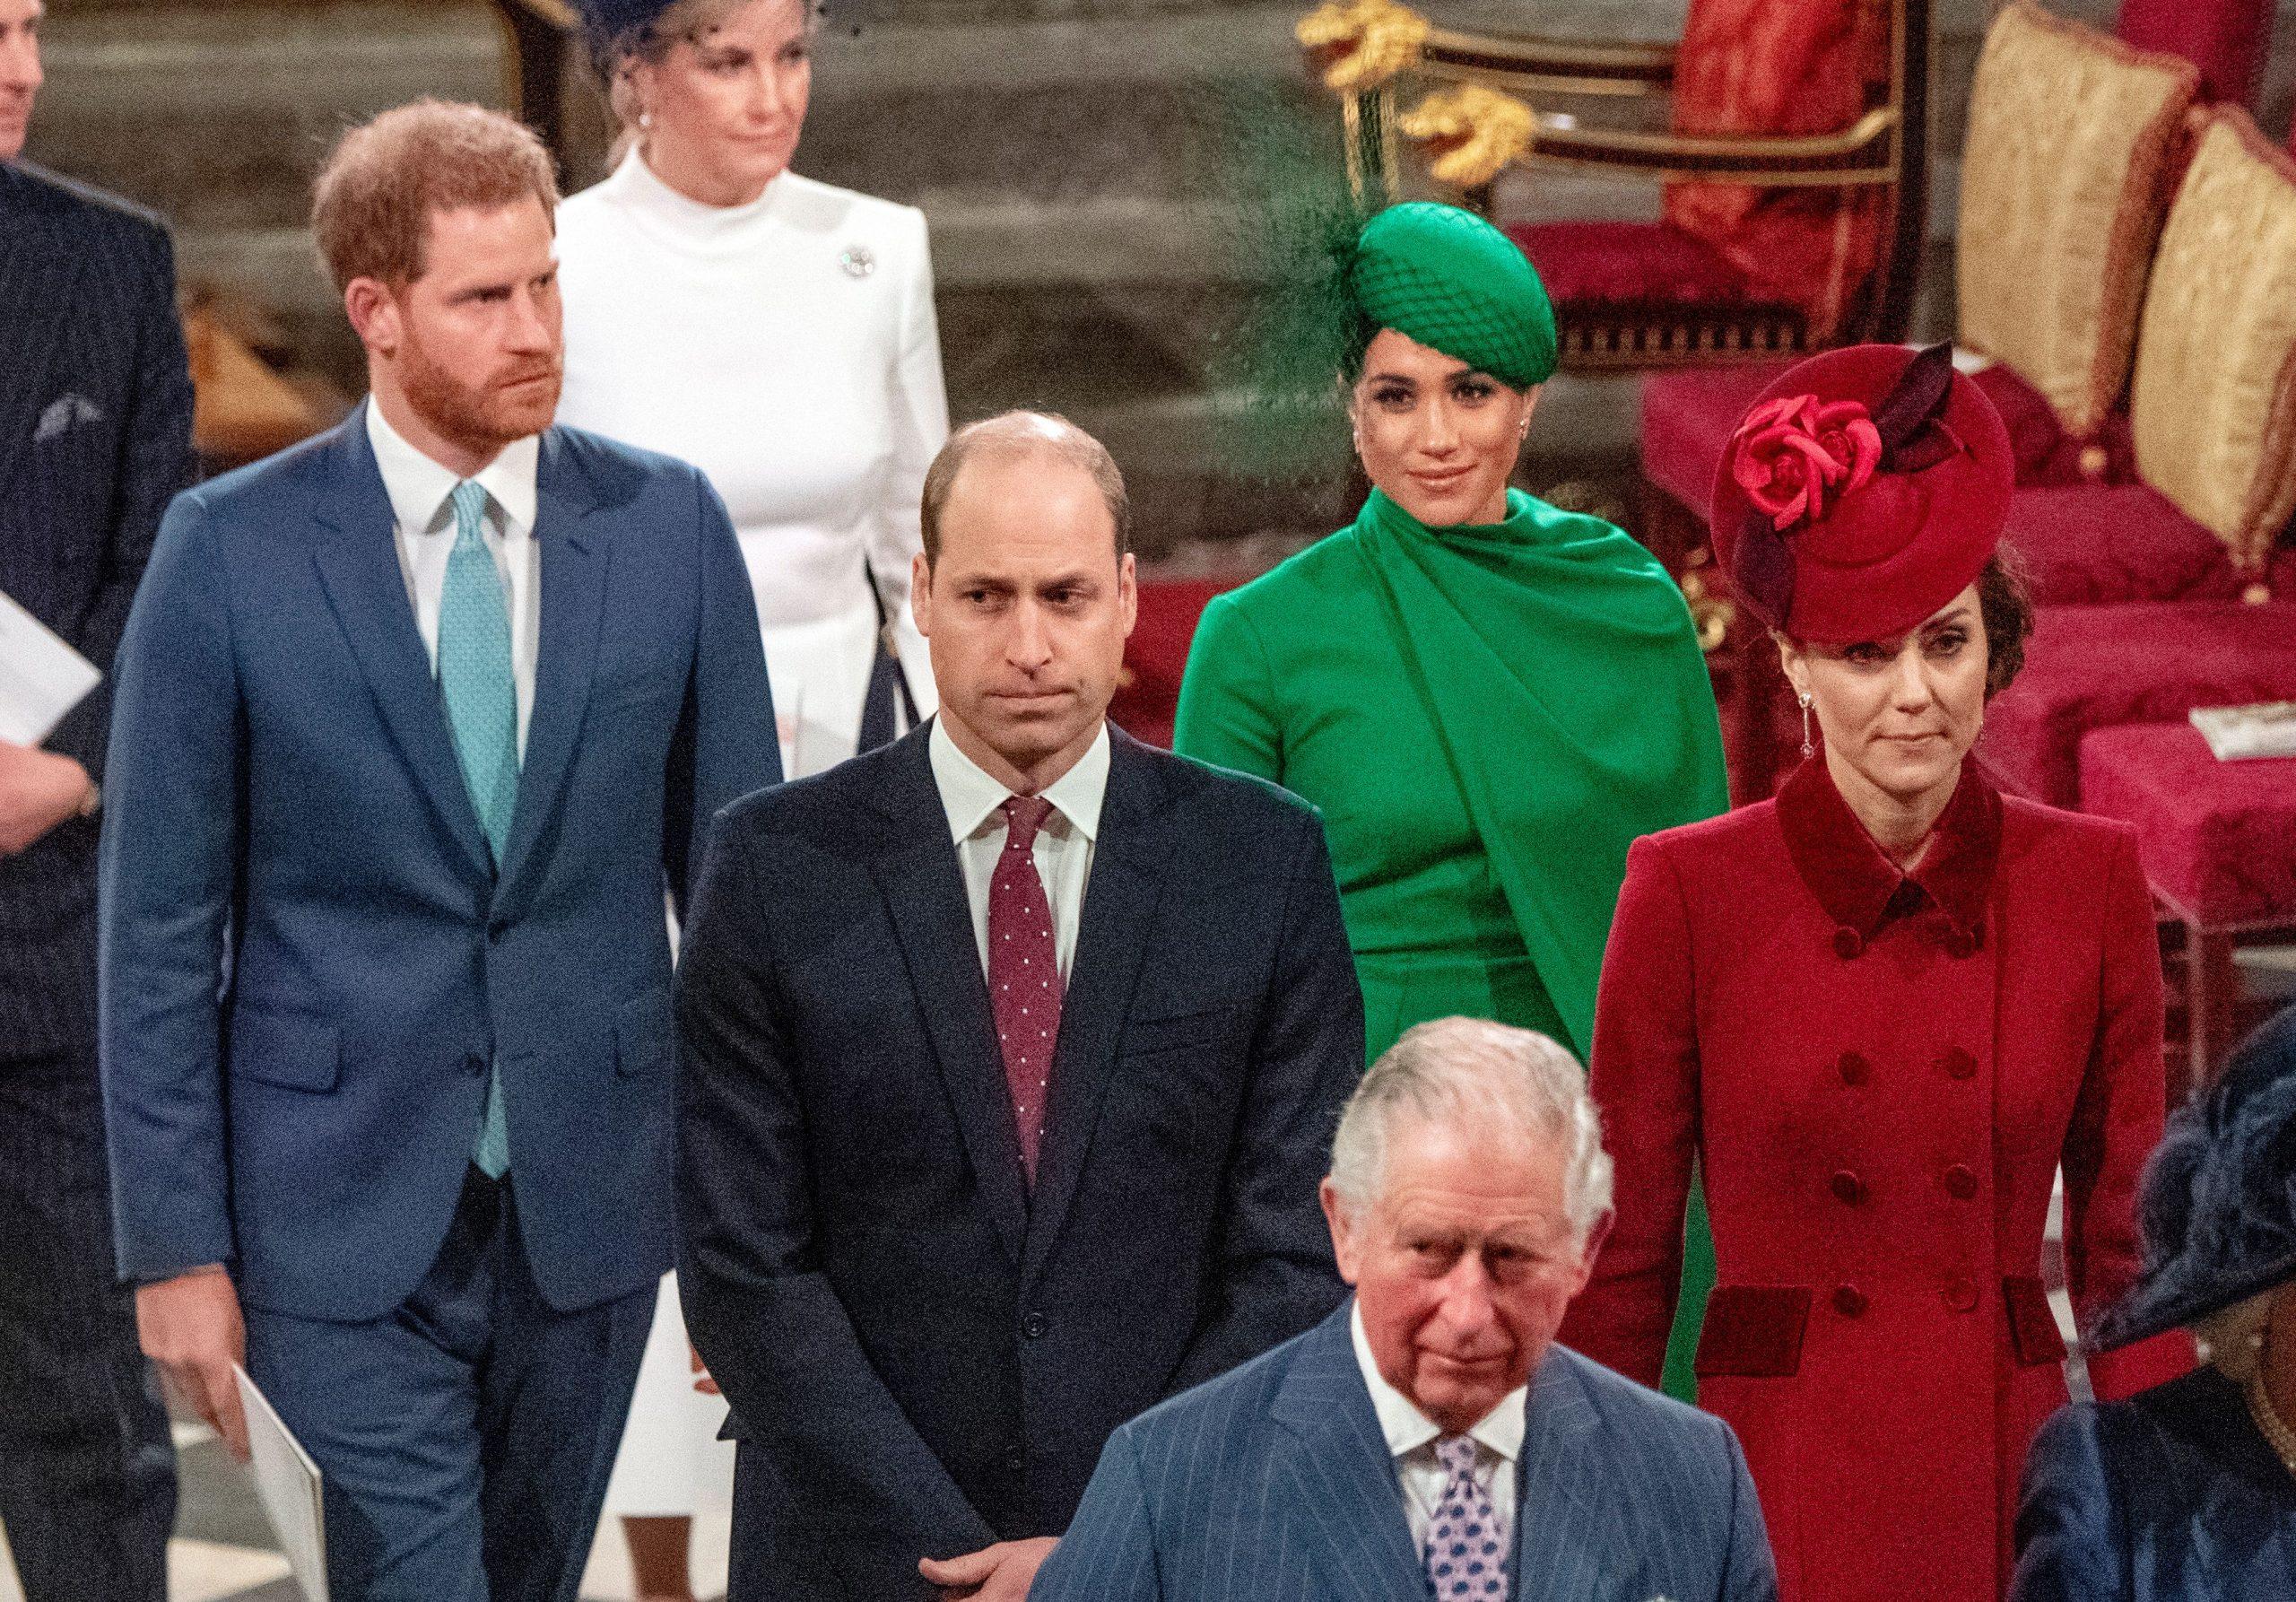 Meghan Markle, Prince Harry, Prince William, Kate Middleton, Prince Charles